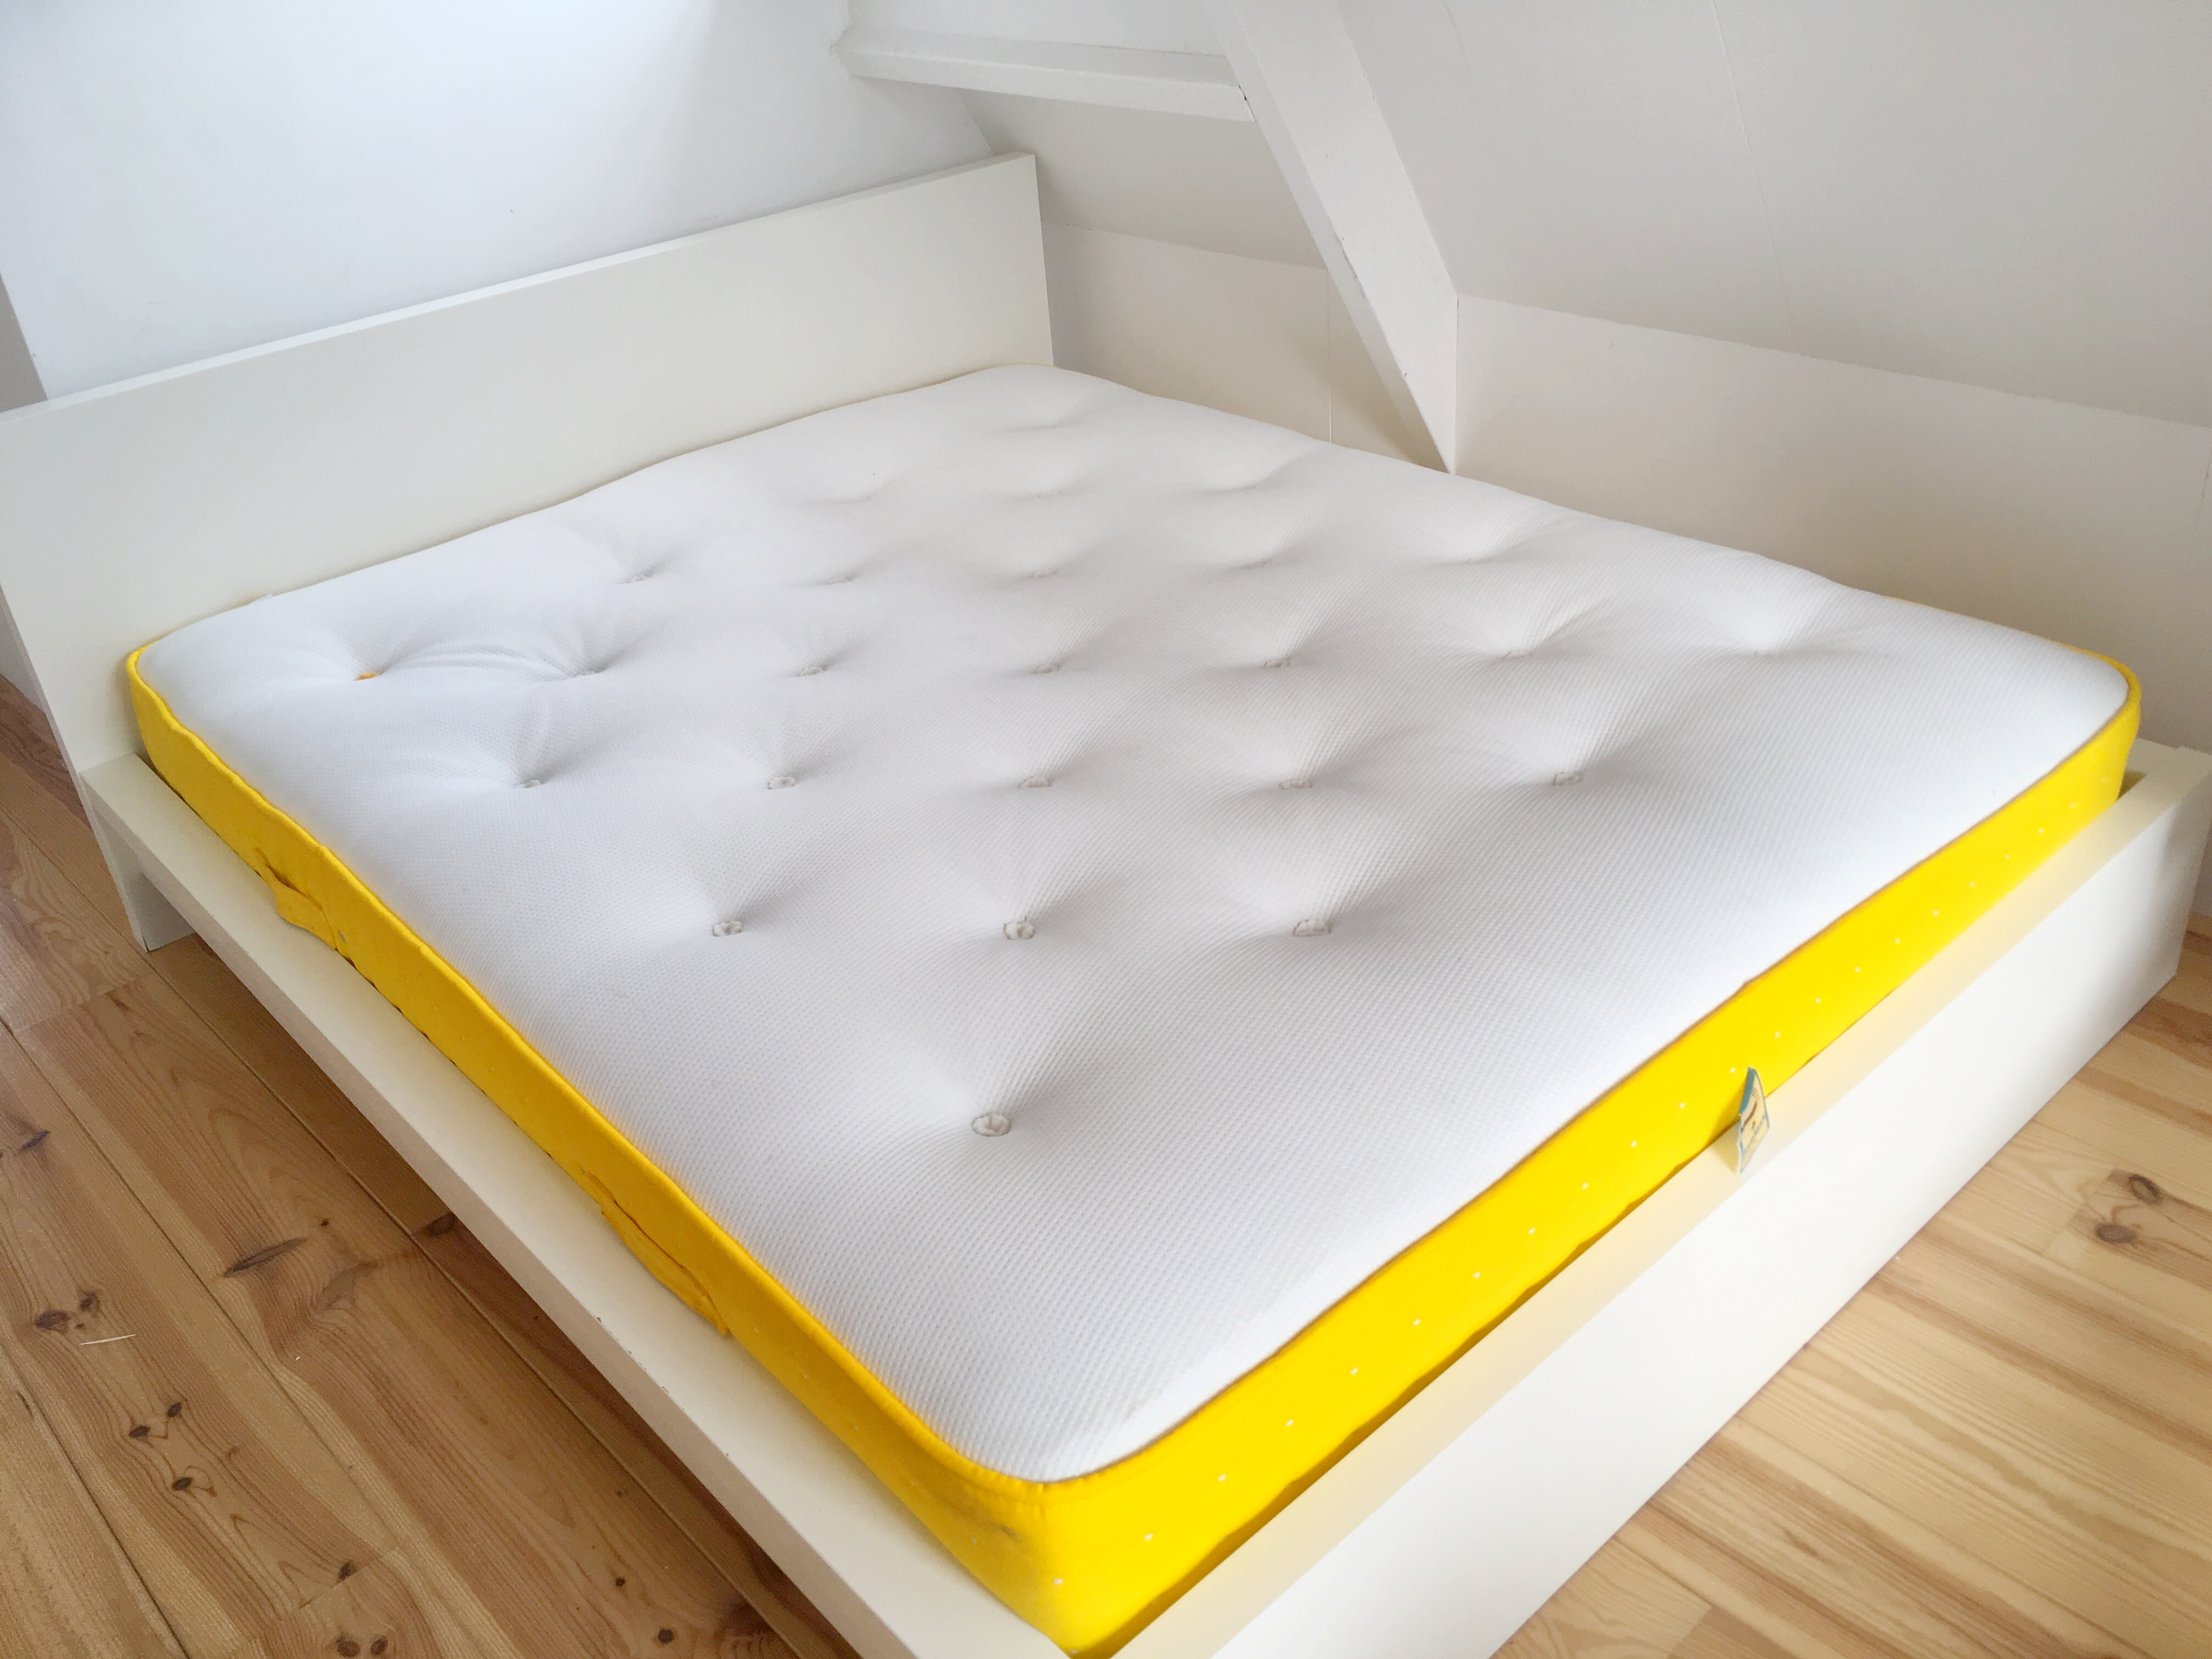 Ikea Pocketvering Matras : Eve sleep pocketvering matras edith sofia